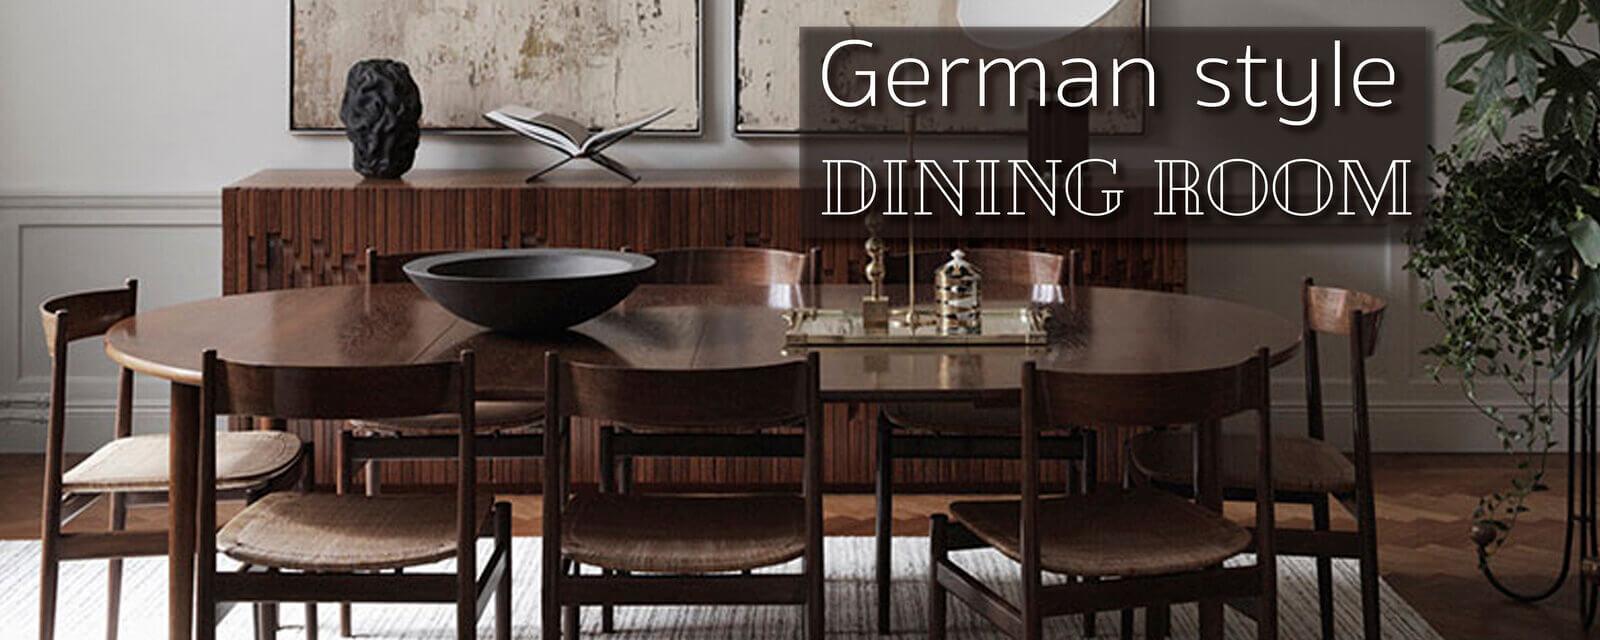 German Style | Dining Room